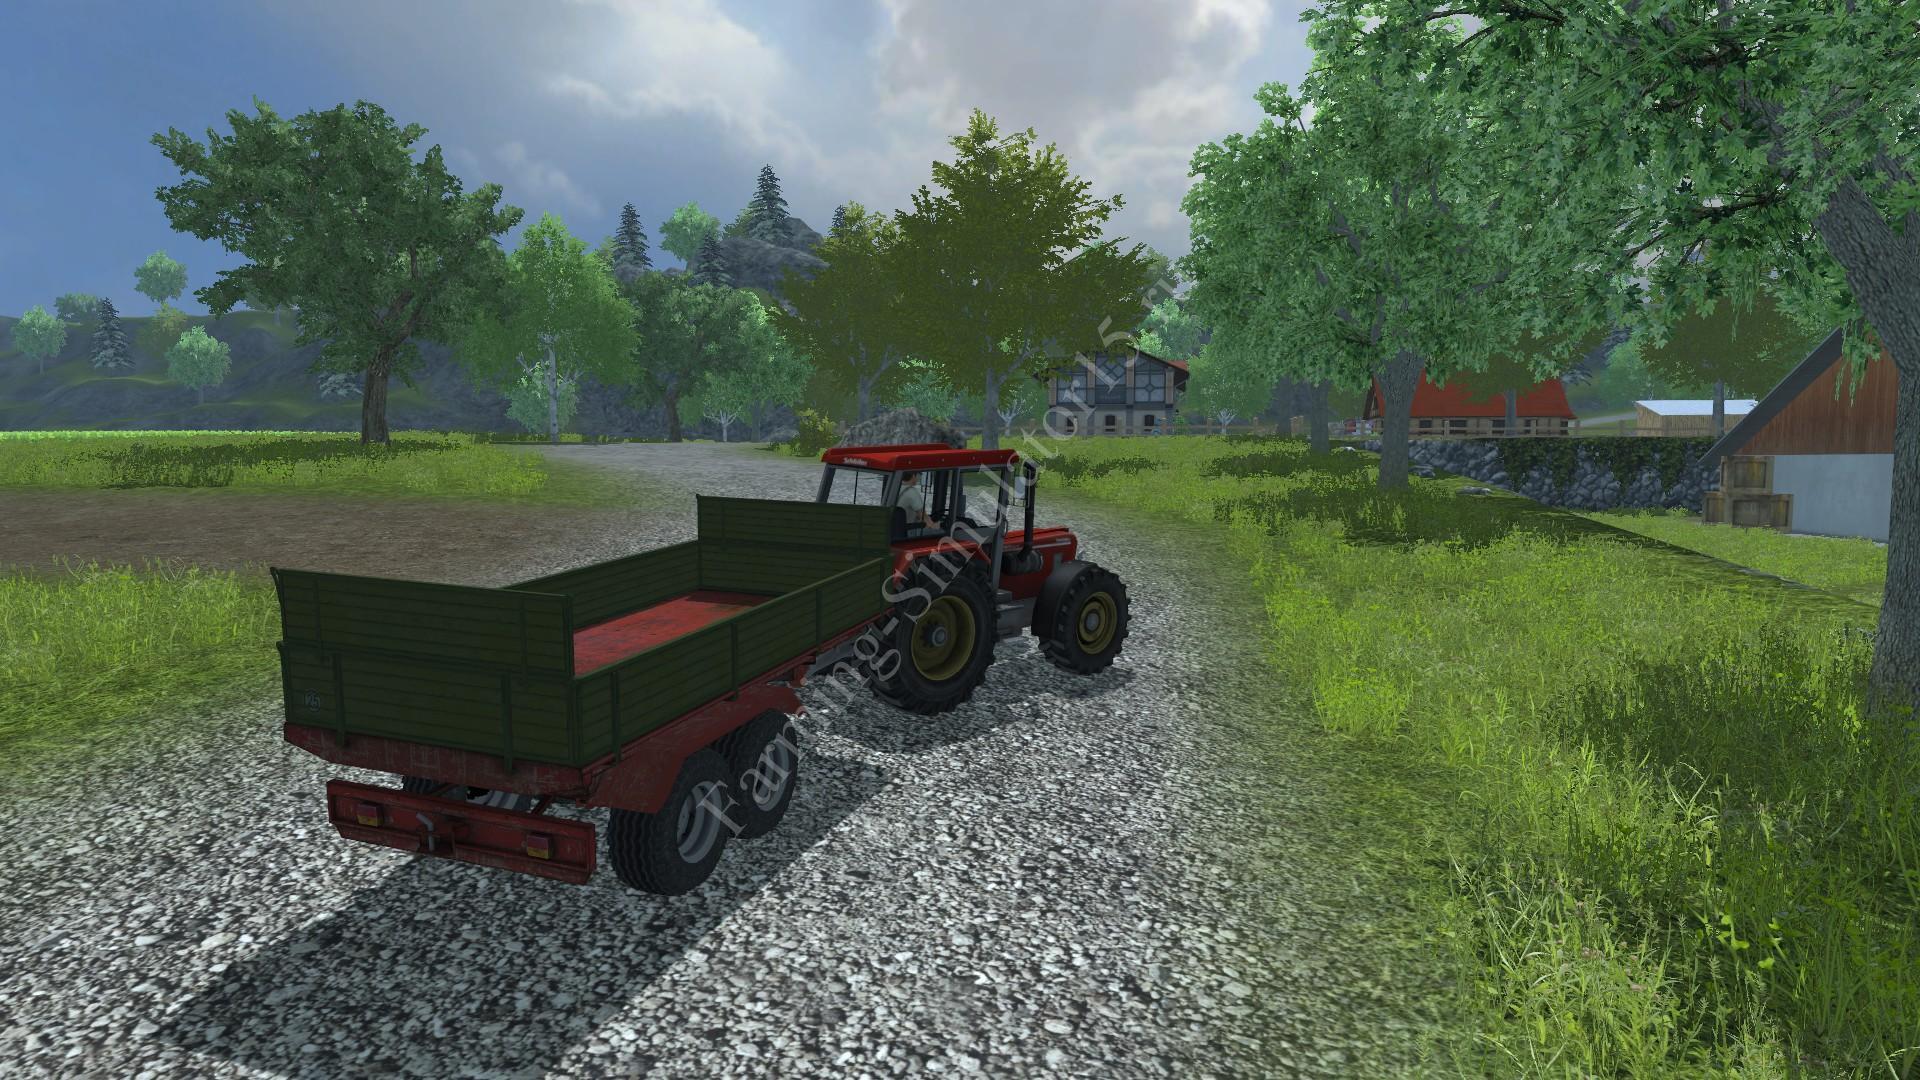 Мод двуосного прицепа Krone Tandem Kipper V 1.0 Farming Simulator 2013, Farming Simulator 13